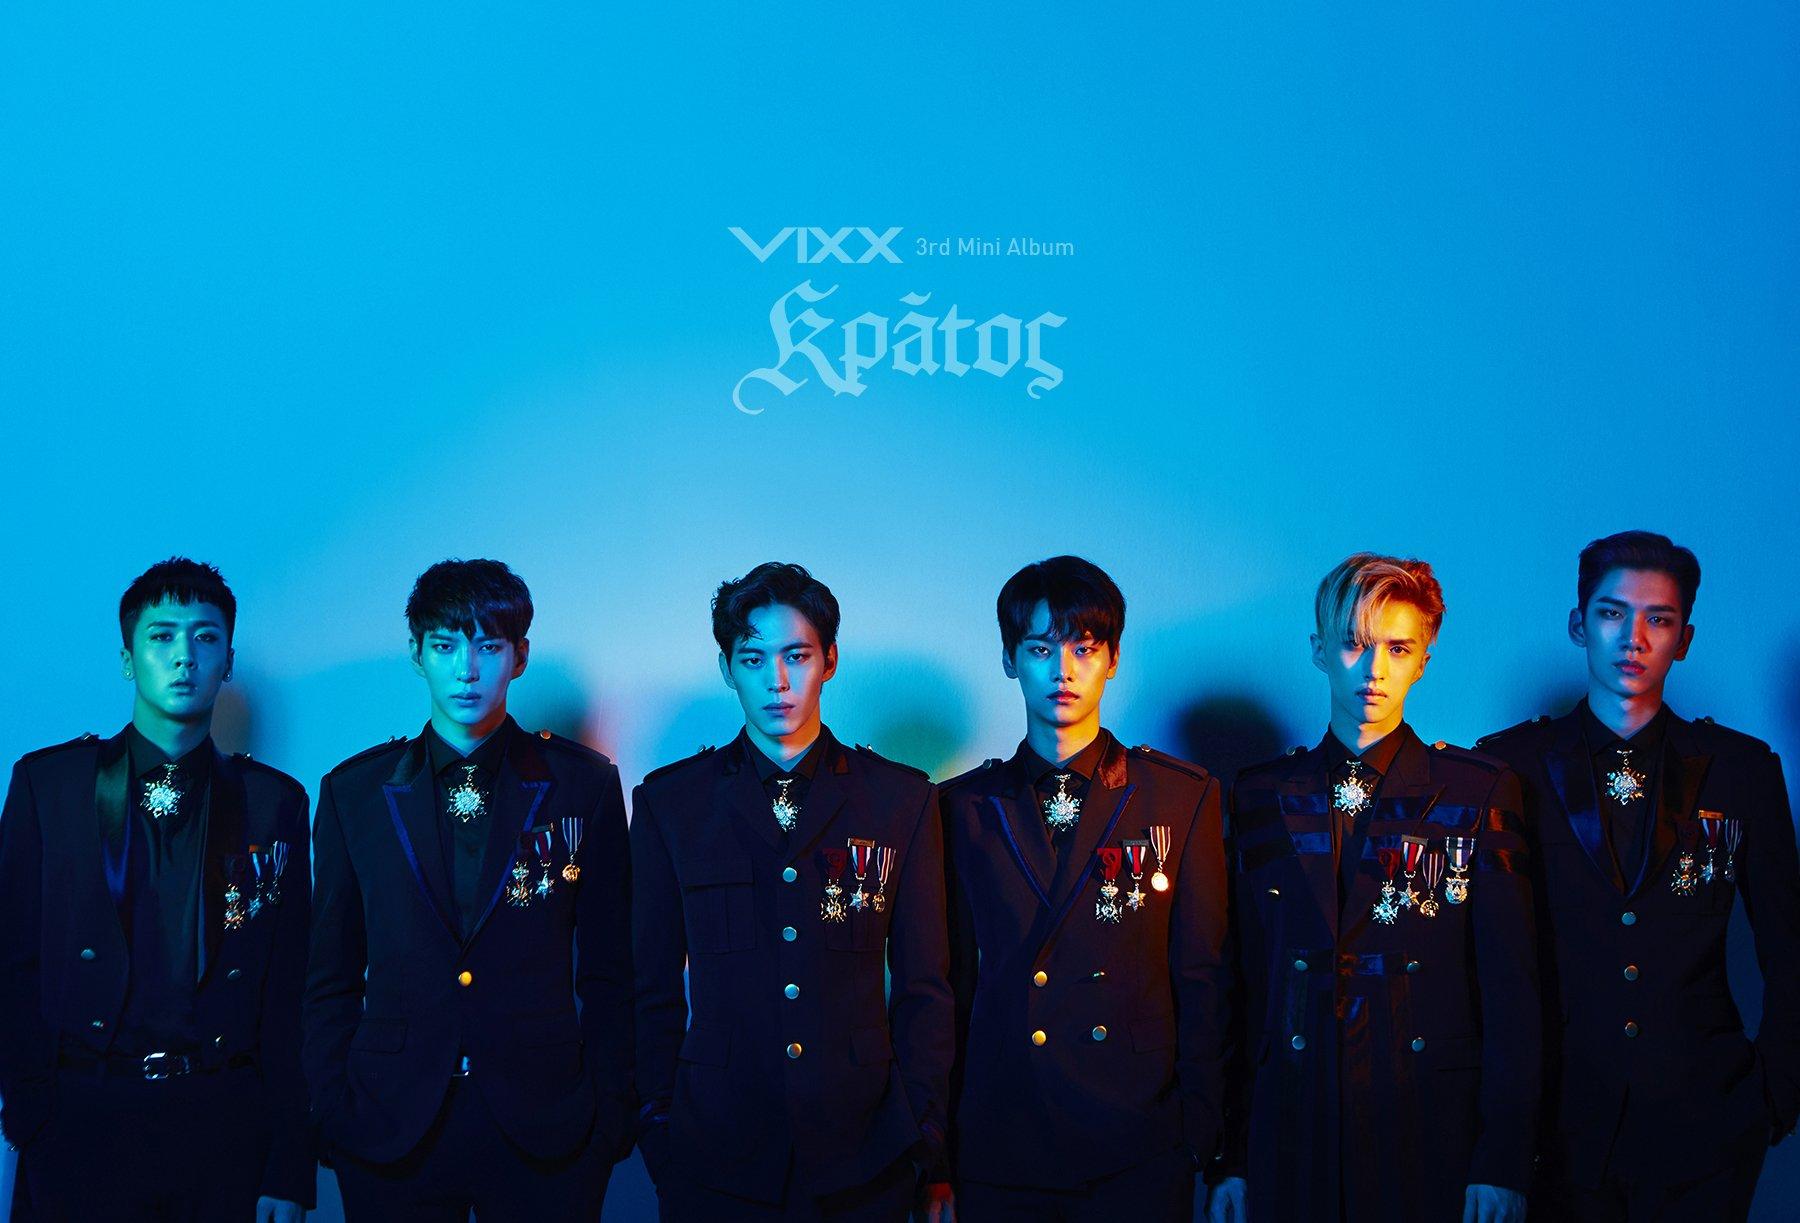 VIXX Appears On Billboard Chart Ahead Of Comeback